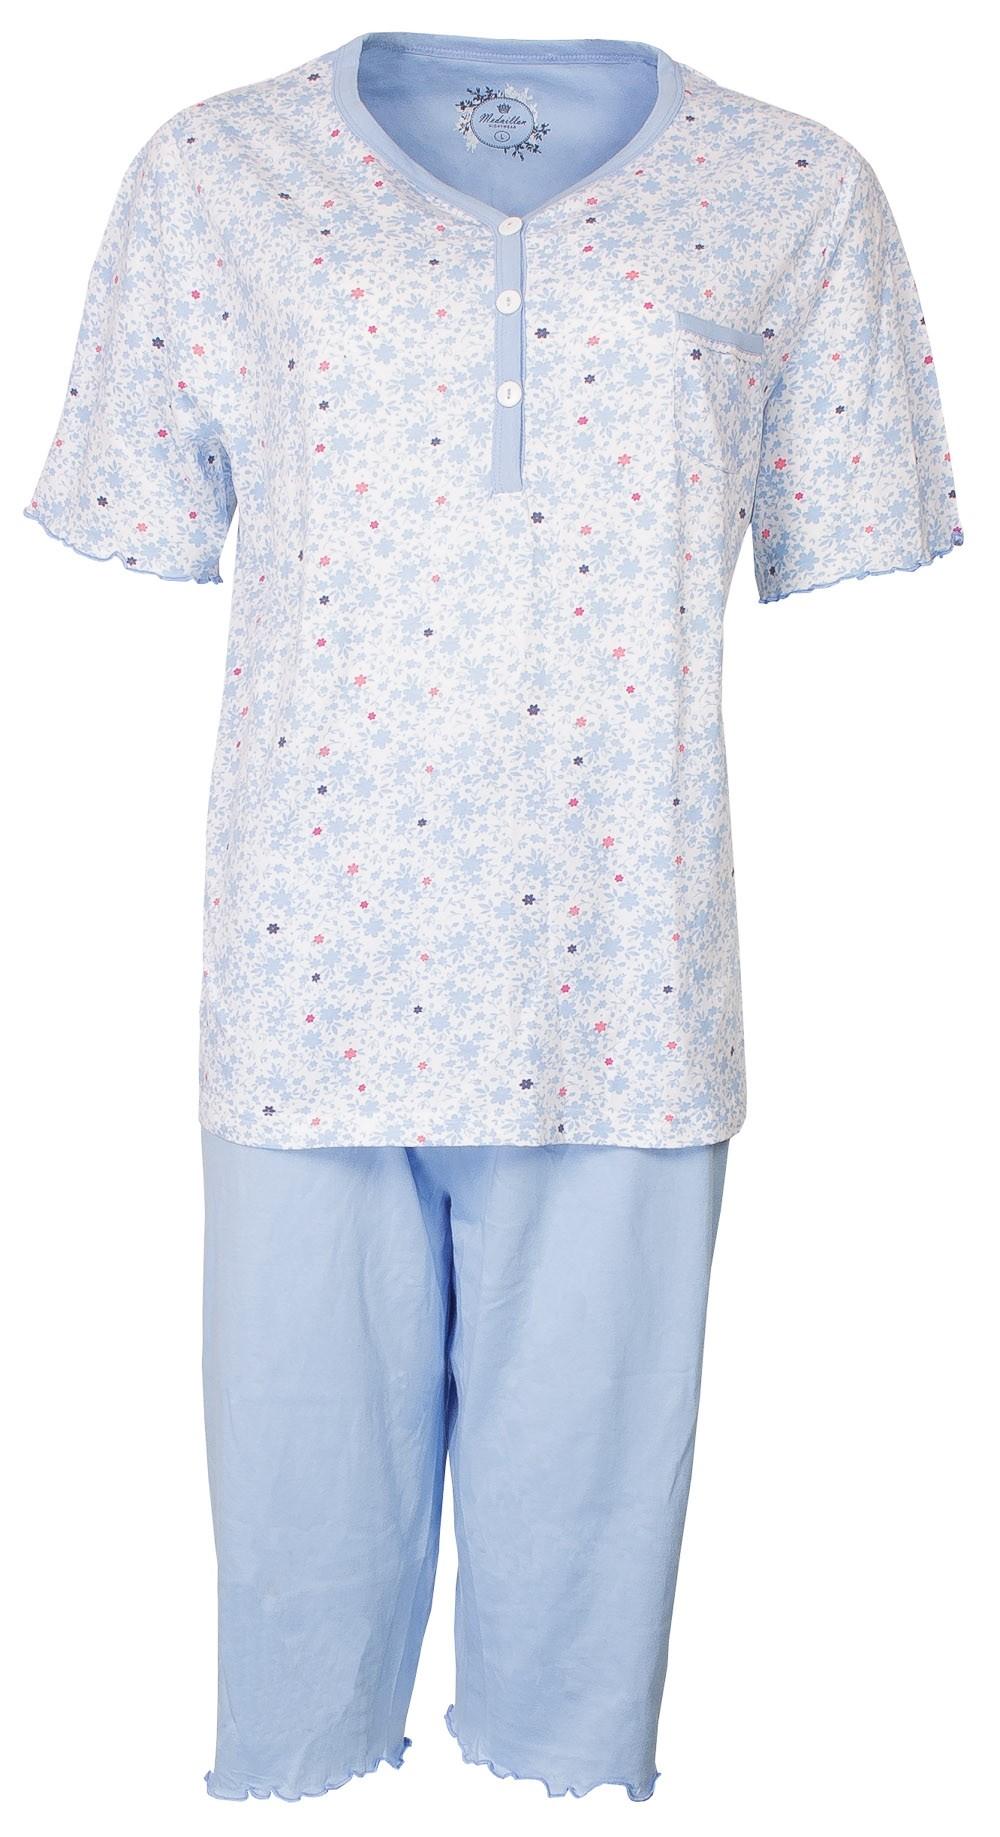 Image of Dames pyjama MEPYD 1803A-L